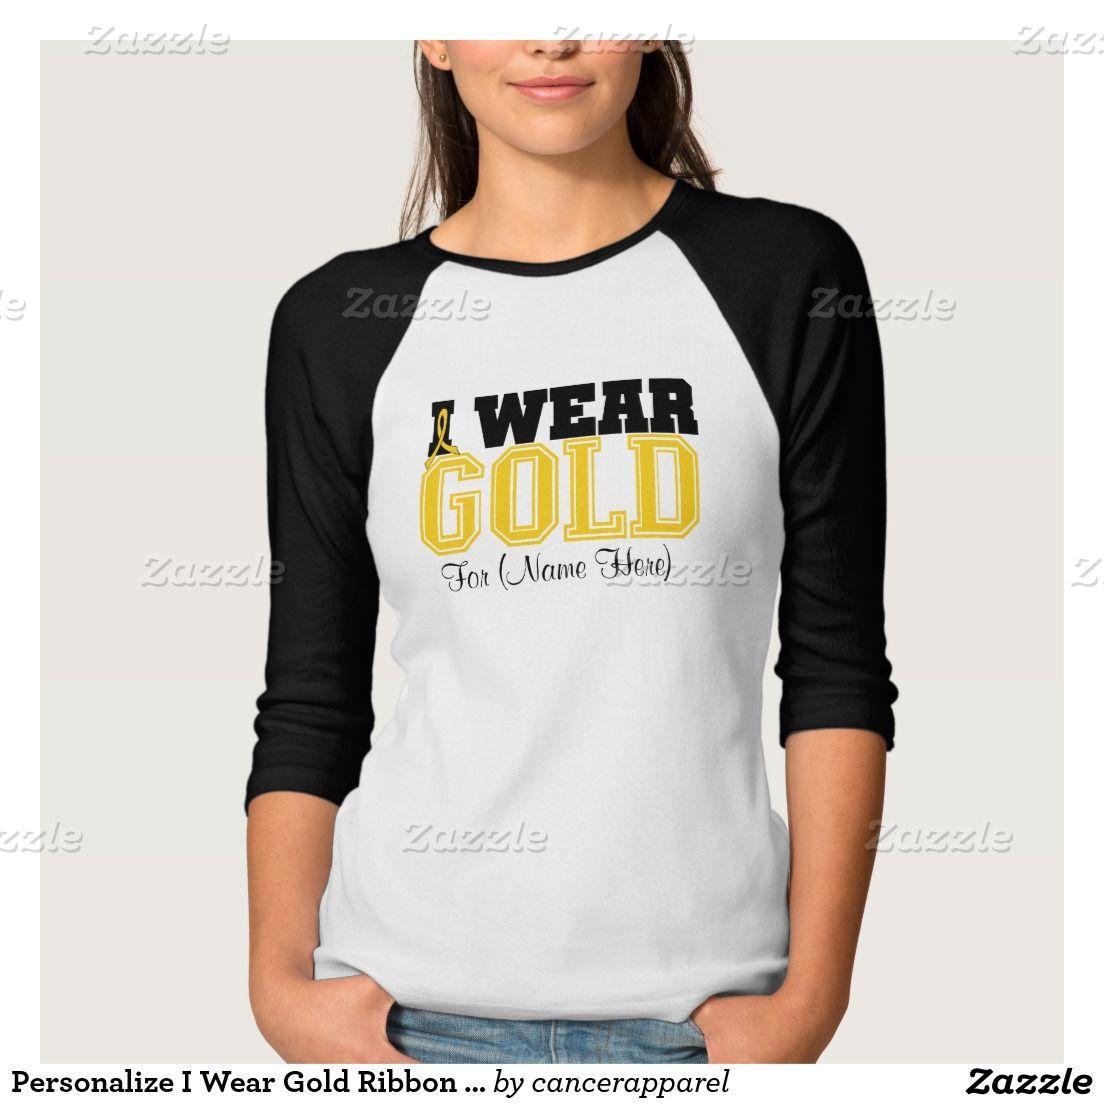 Personalize I Wear Gold Ribbon Childhood Cancer Tshirts